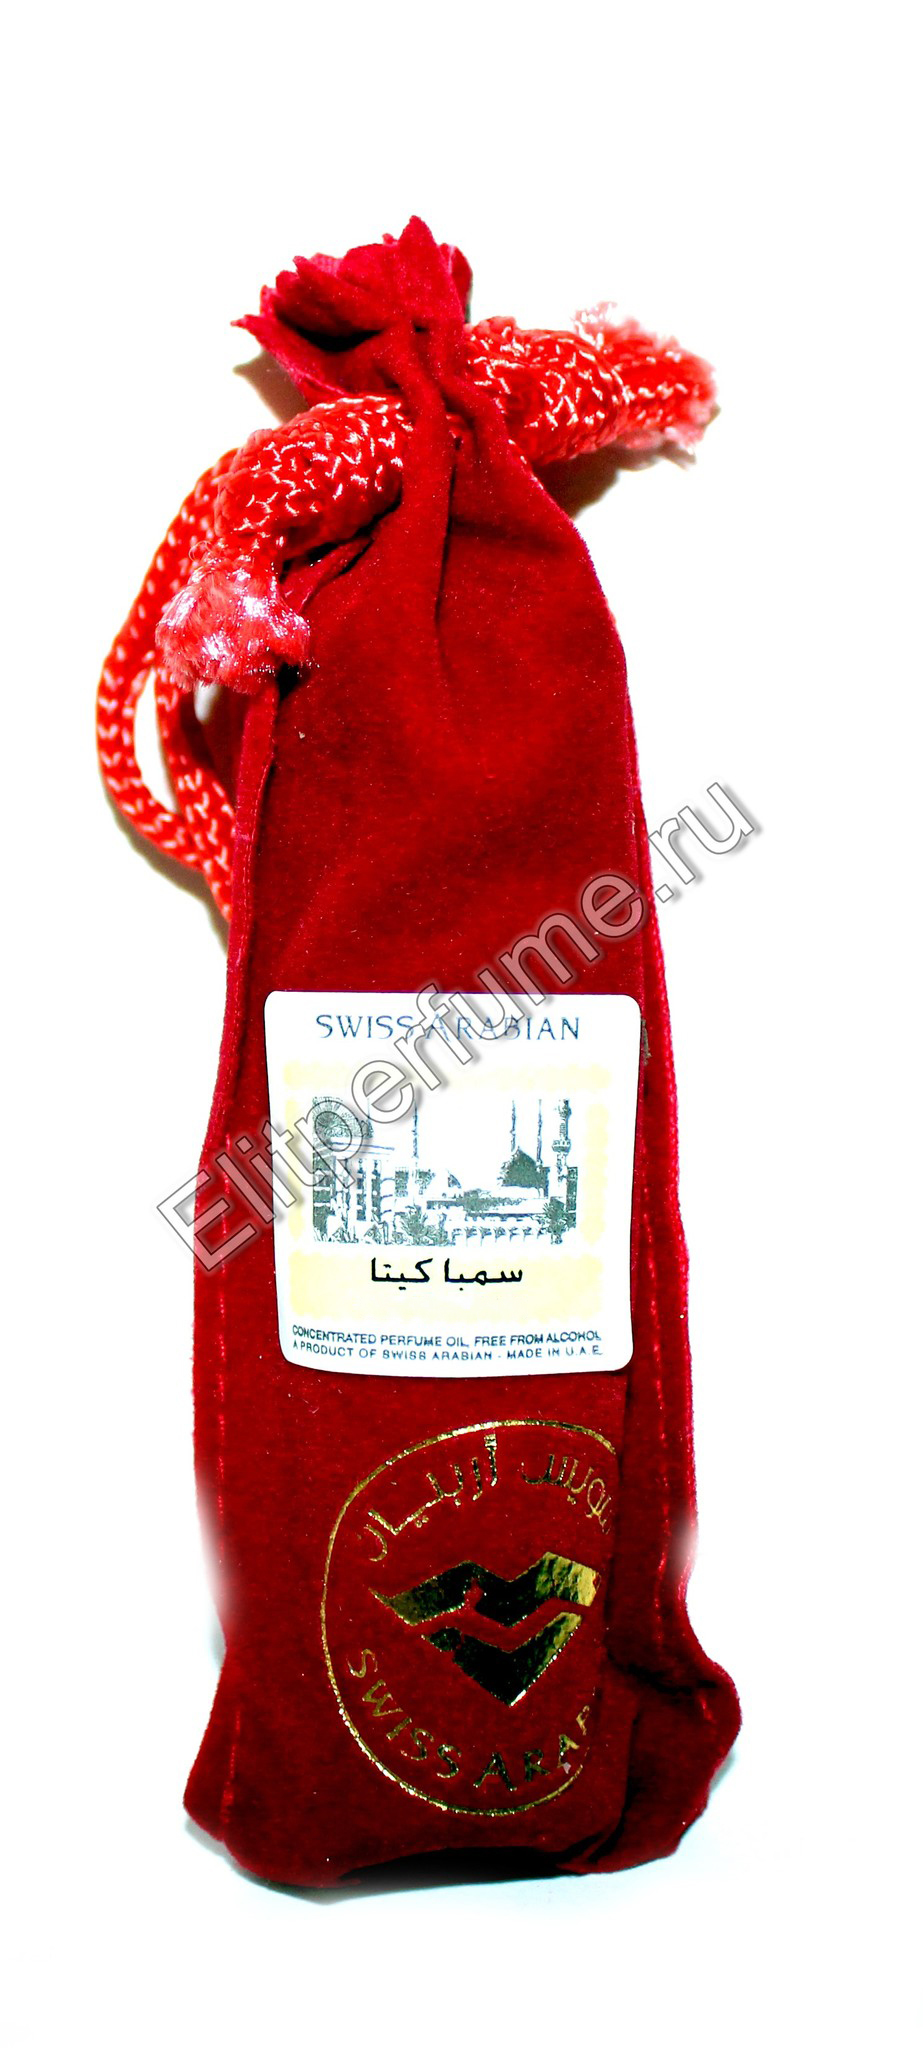 Kalimat Калимат 10 мл арабские масляные духи от Свисс Арабиан Swiss Arabian